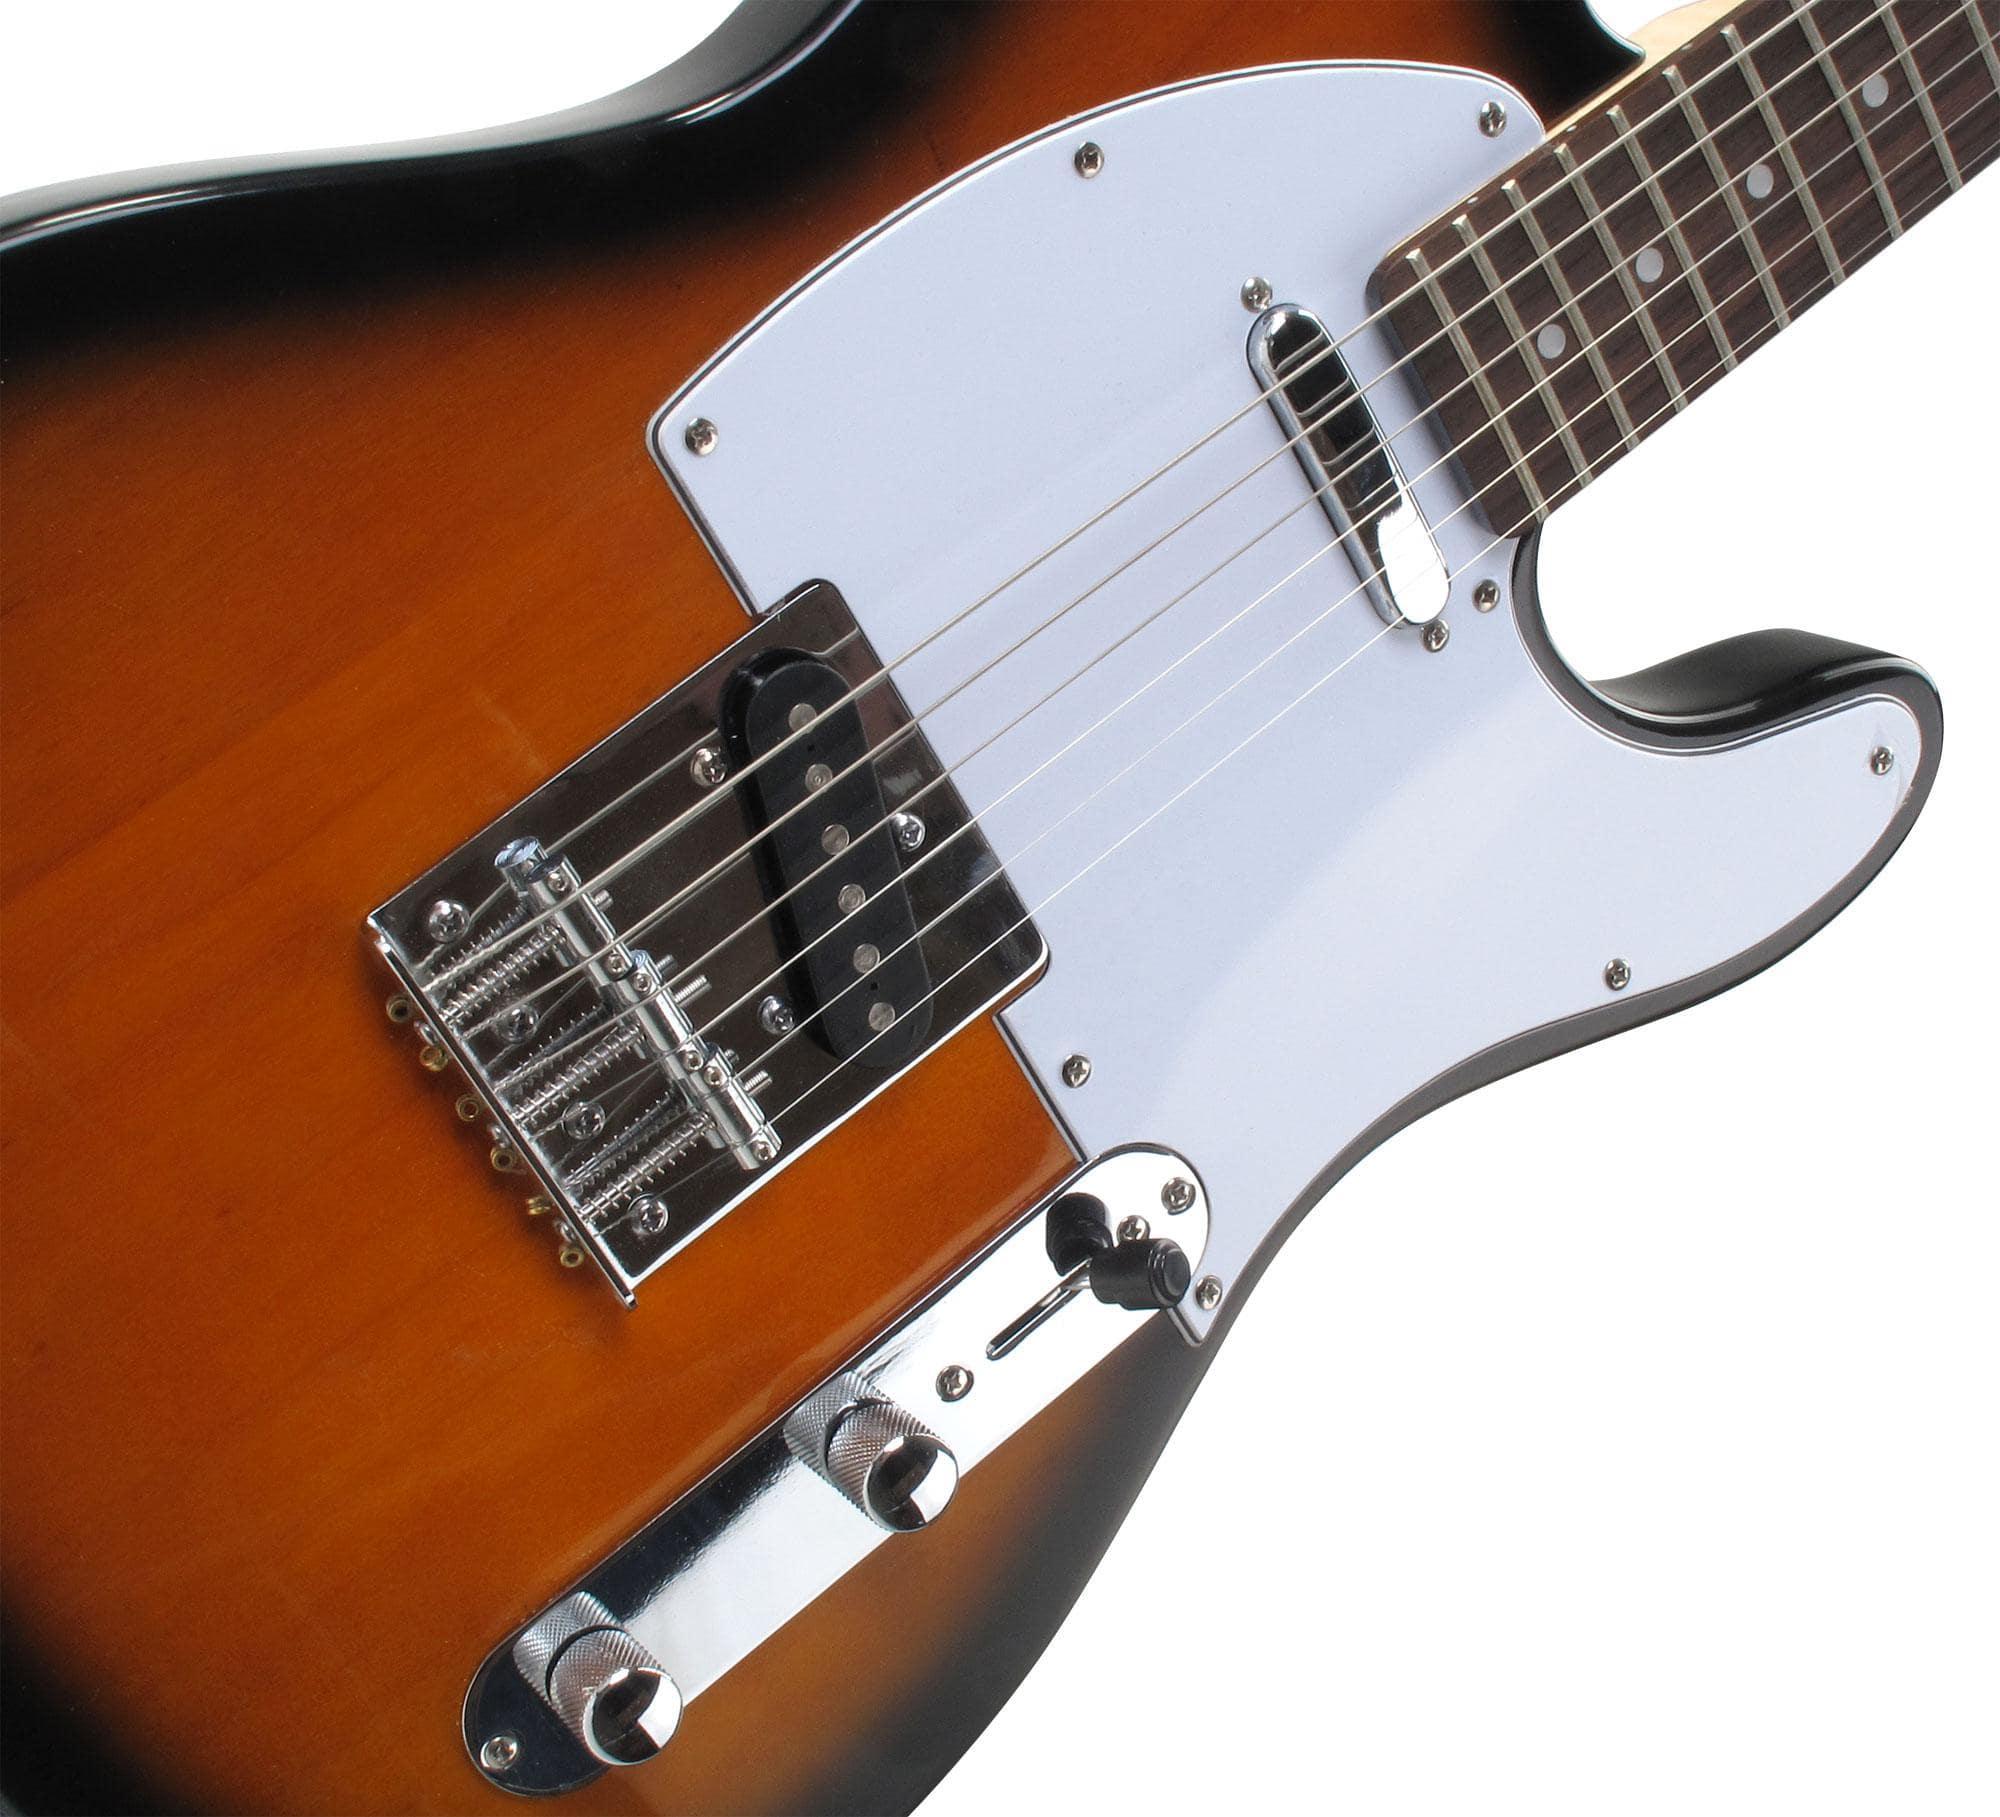 rocktile per tl100 sb electric guitar 2 tone sunburst with accessories. Black Bedroom Furniture Sets. Home Design Ideas